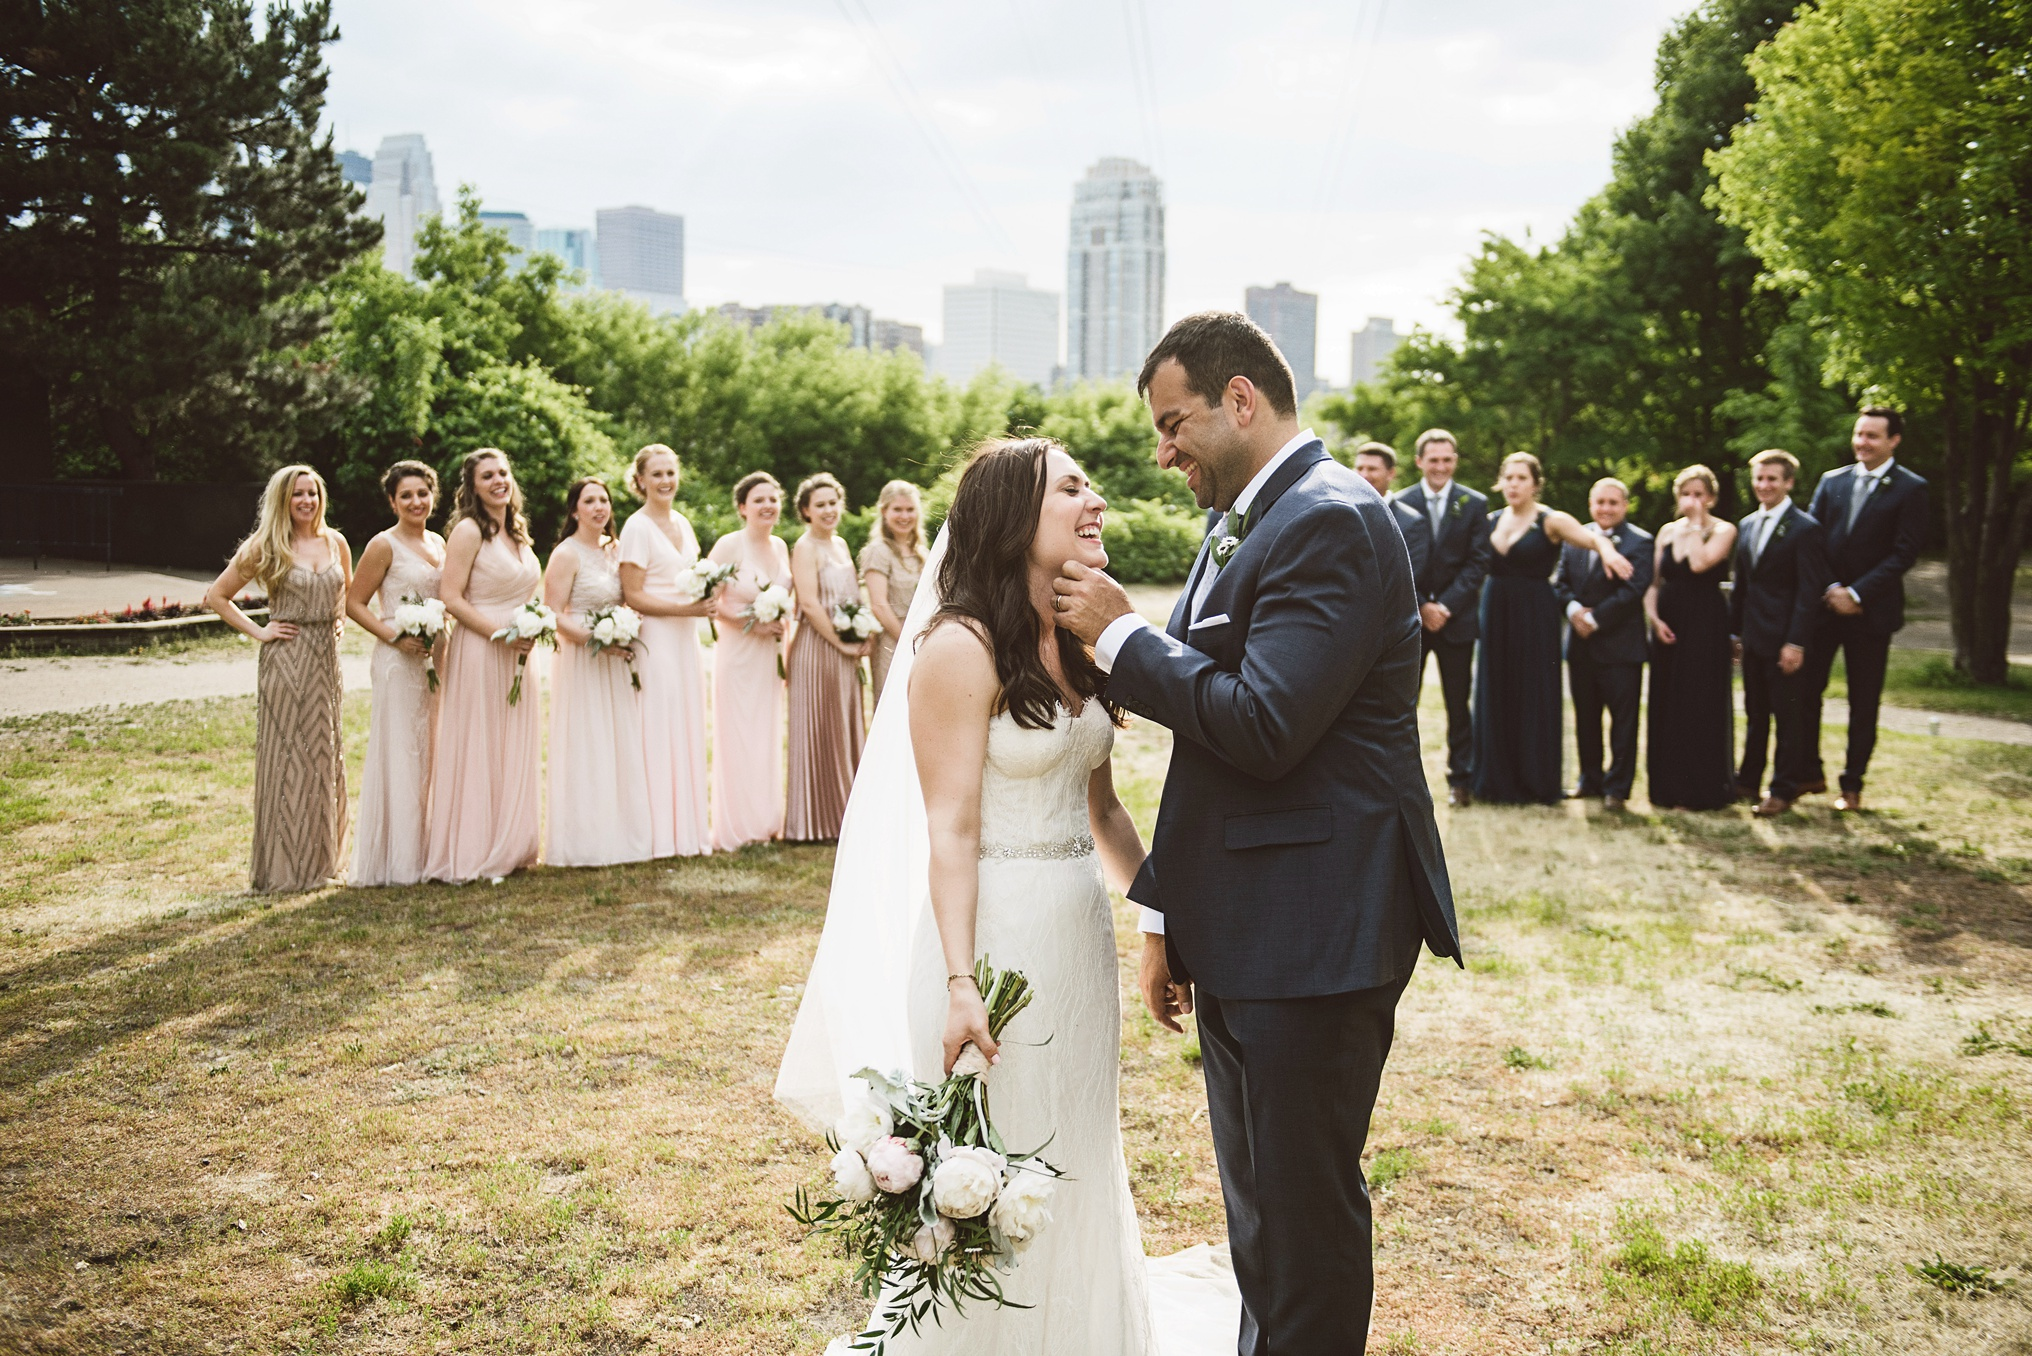 best_wedding_photography_2017_by_lucas_botz_photography_105.jpg